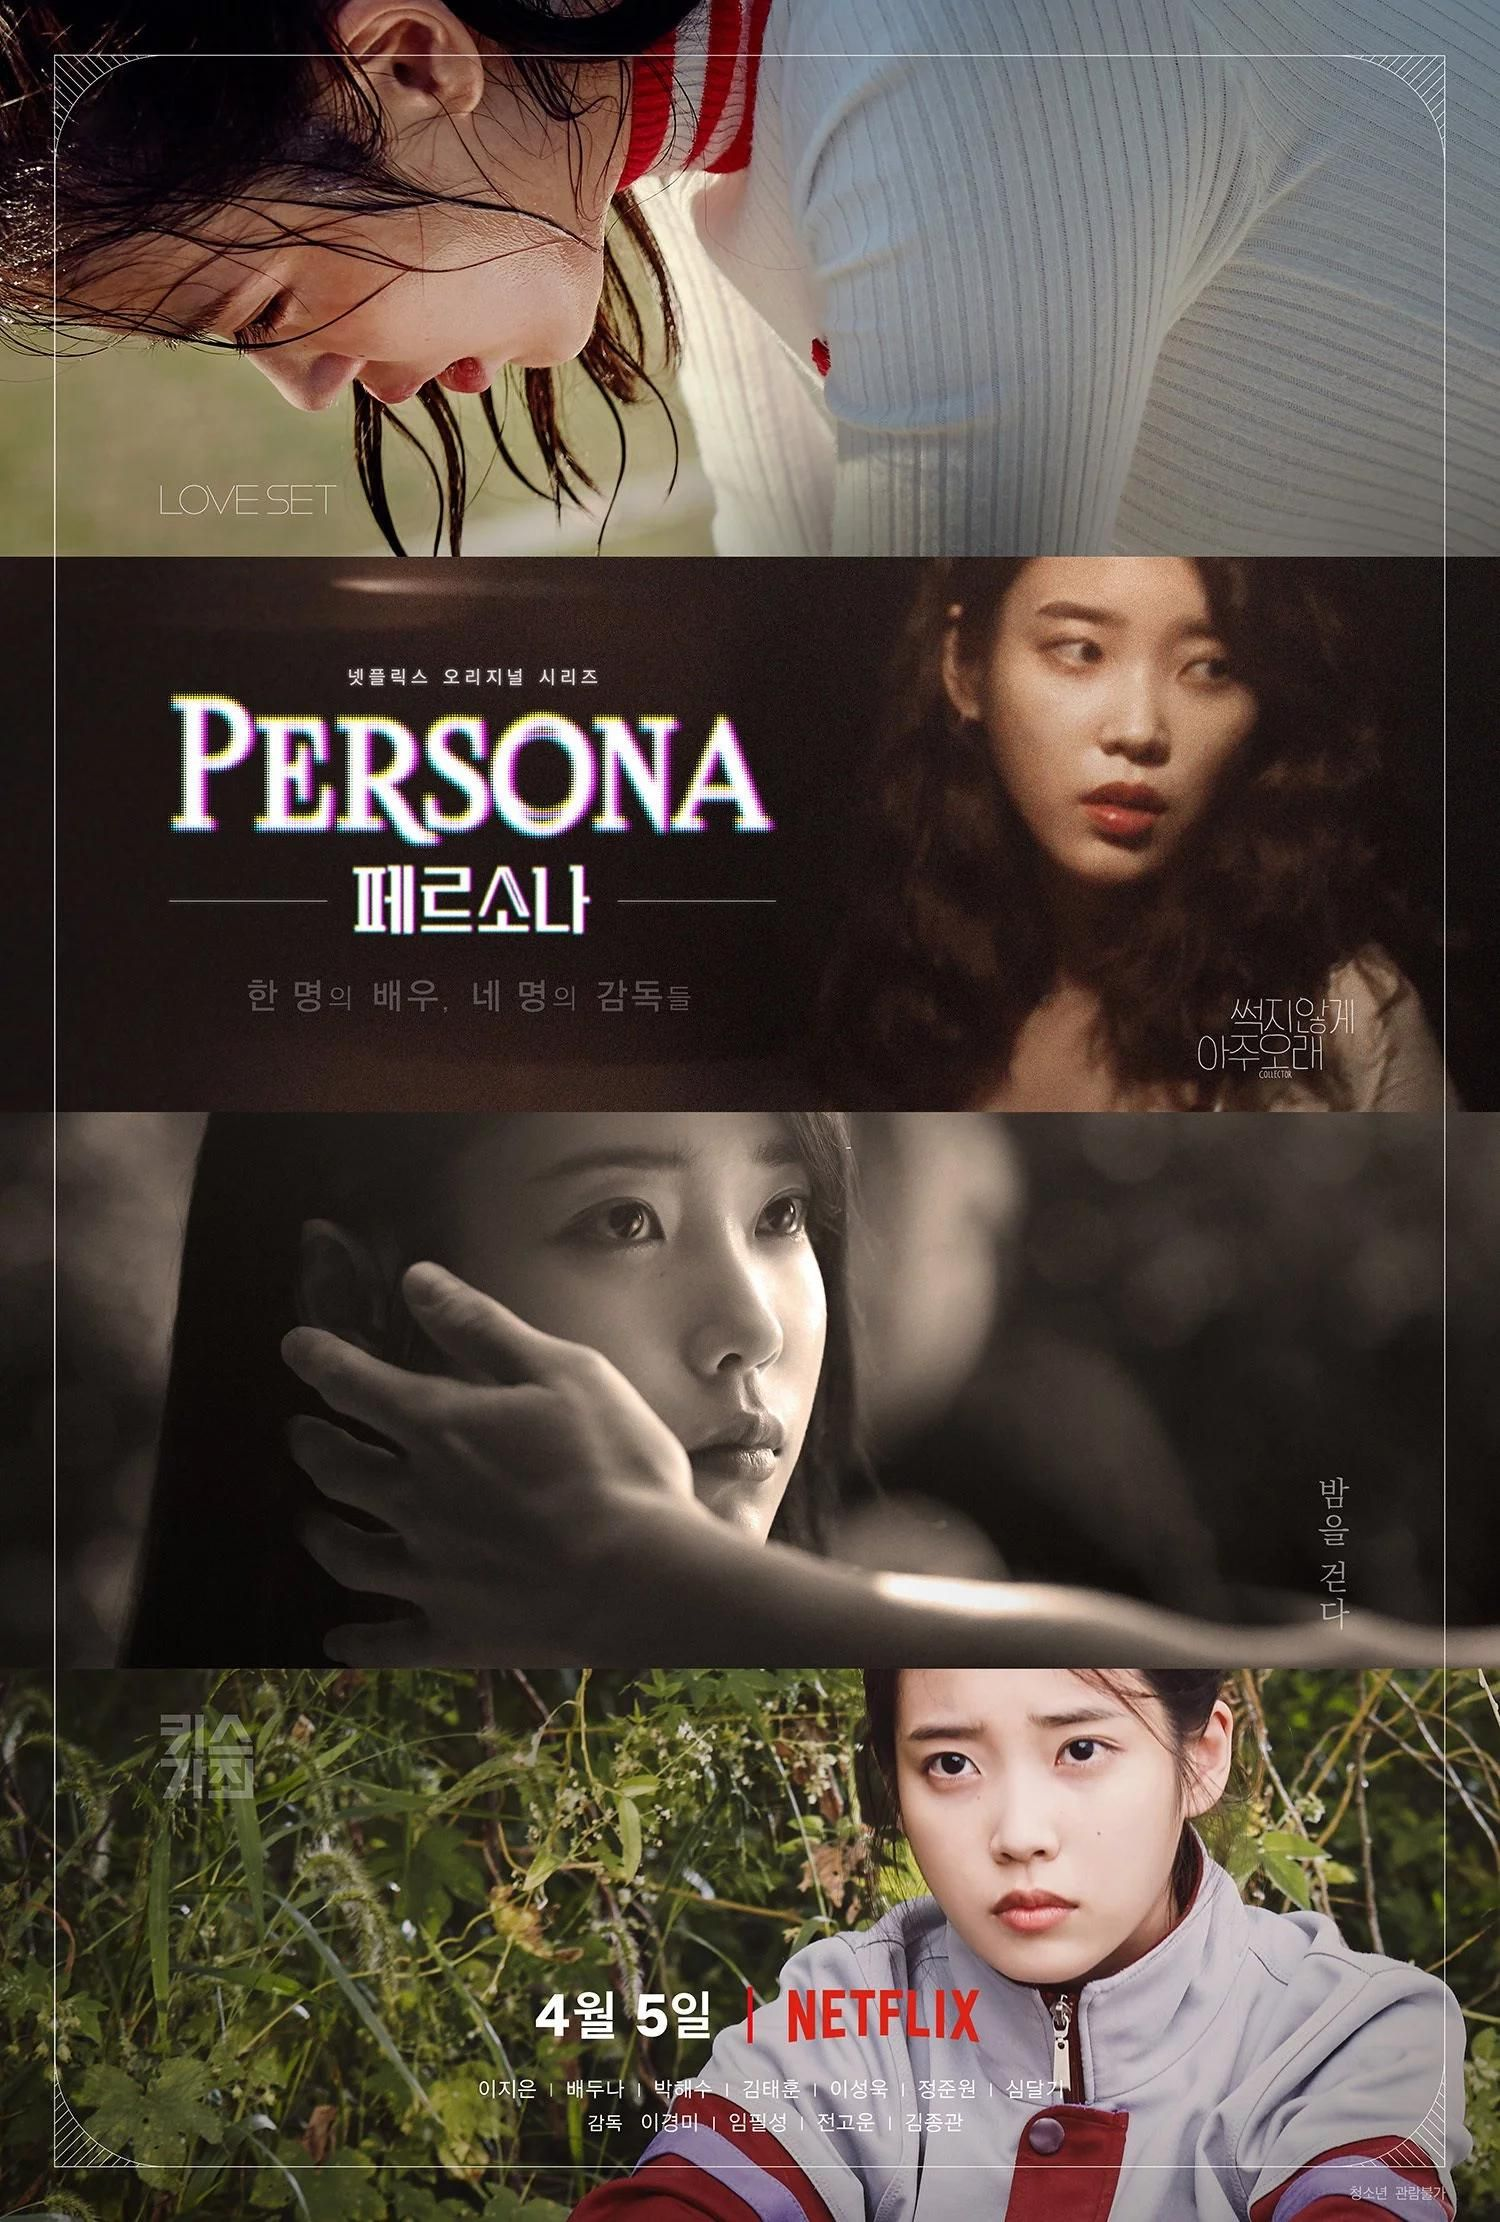 Persona 페르소나 (2019) Drama, Korean drama, Persona